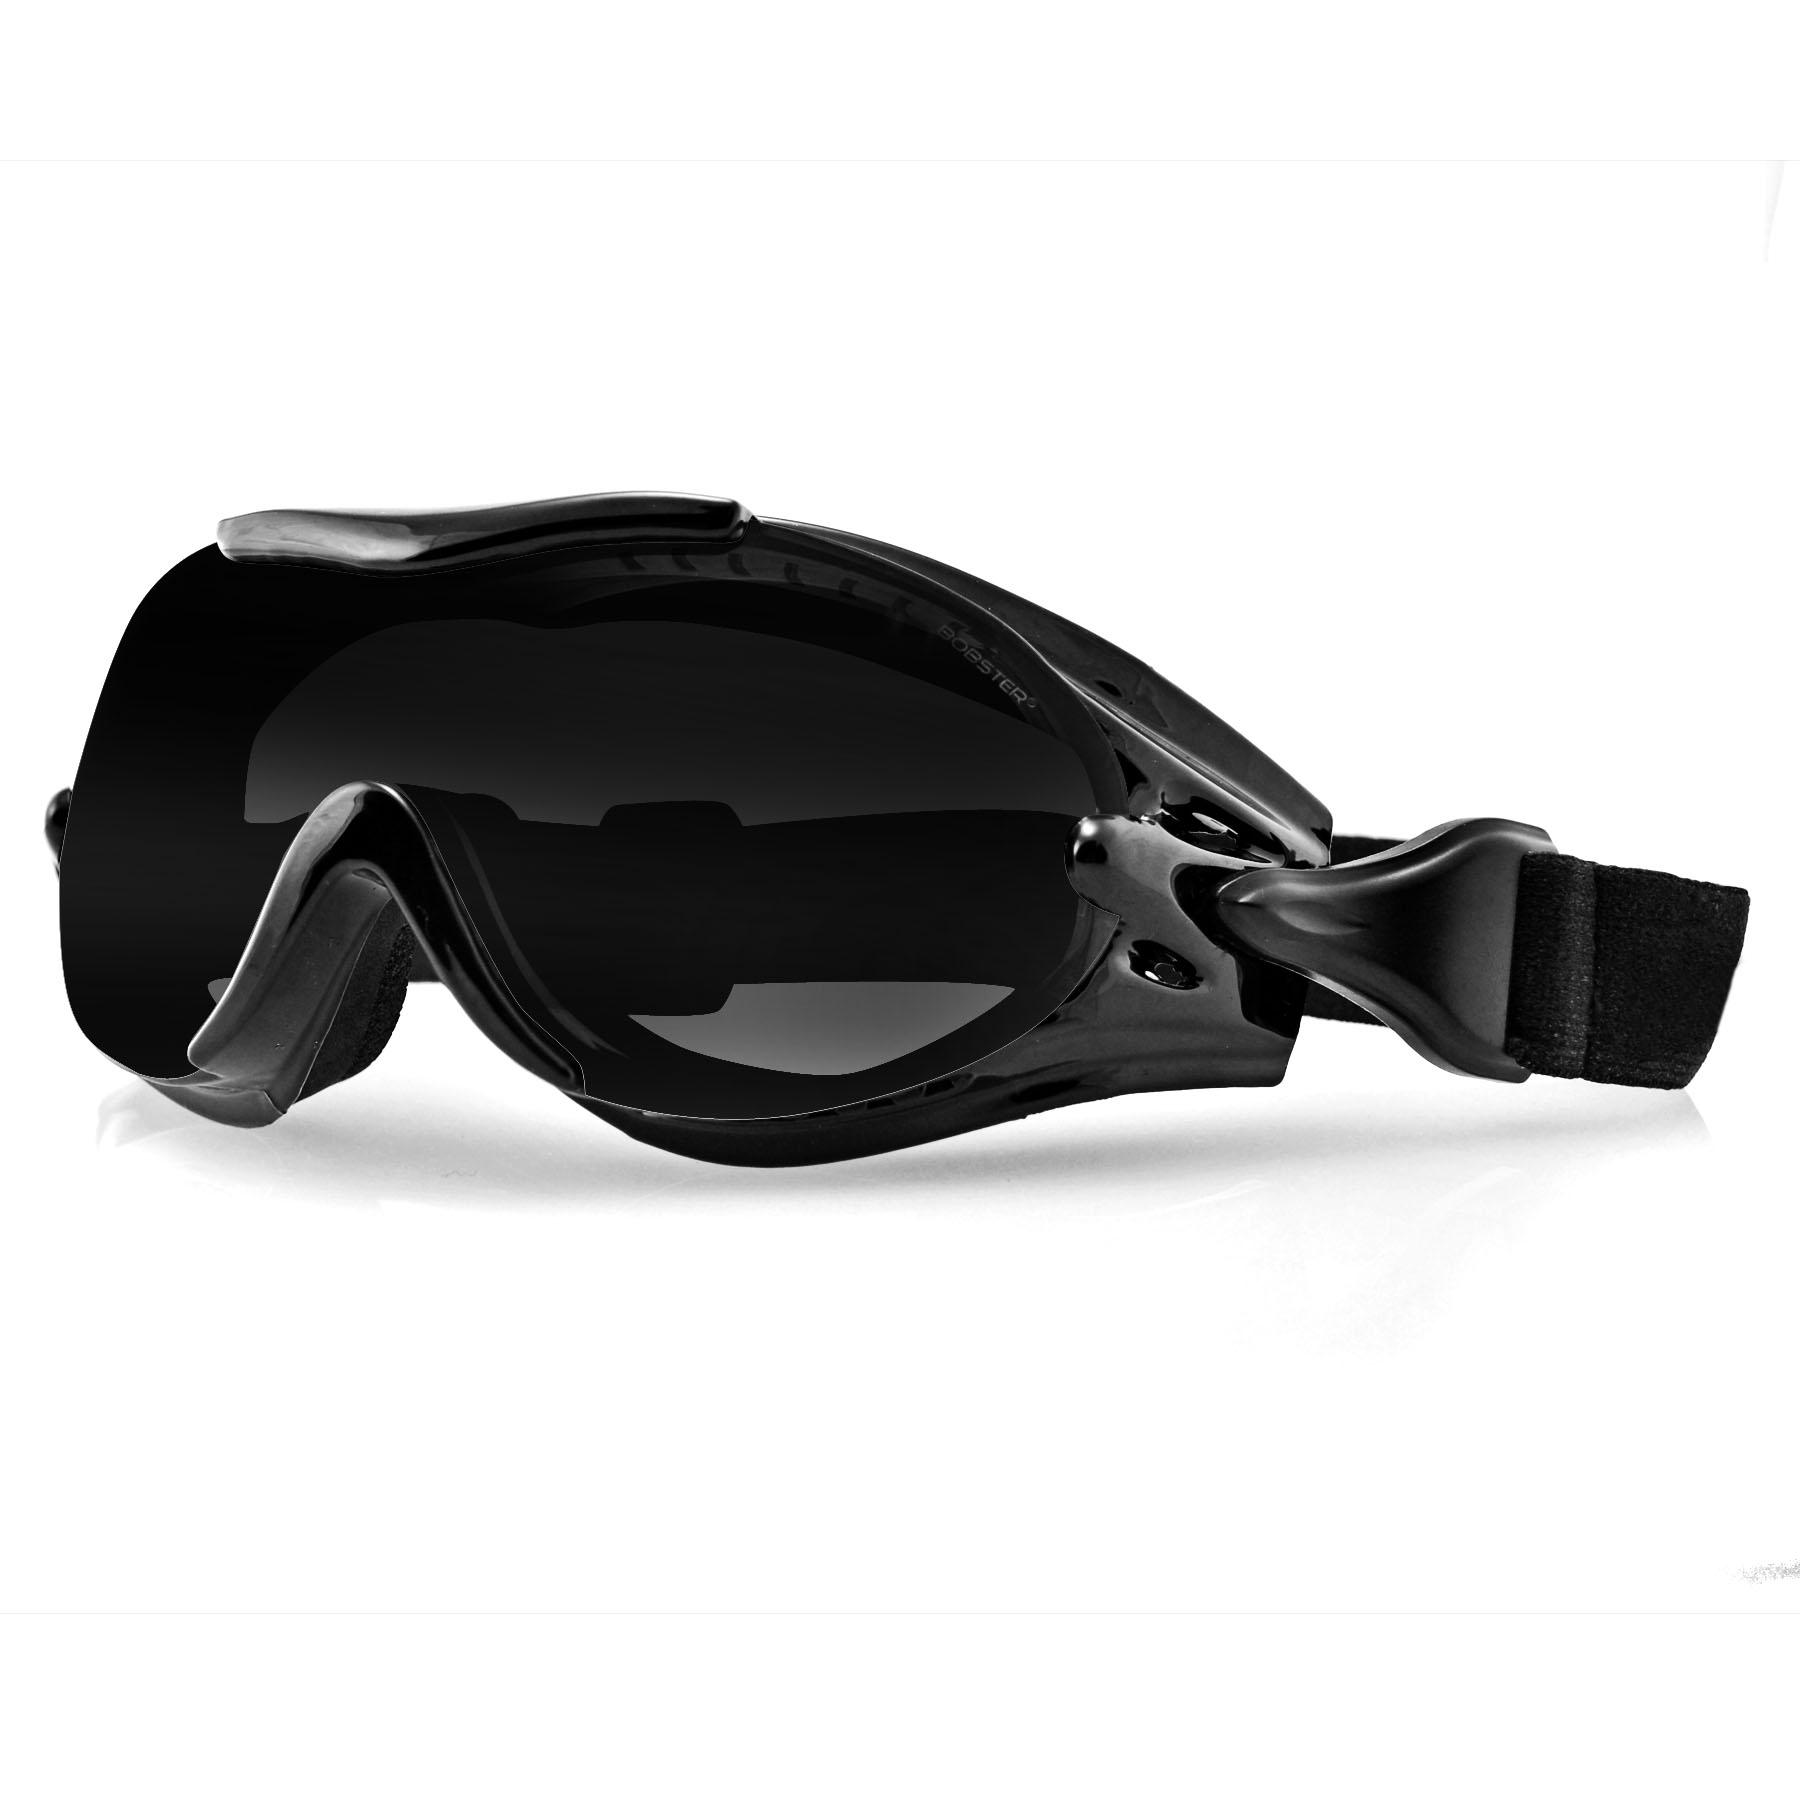 Phoenix interchangeable OTG goggles